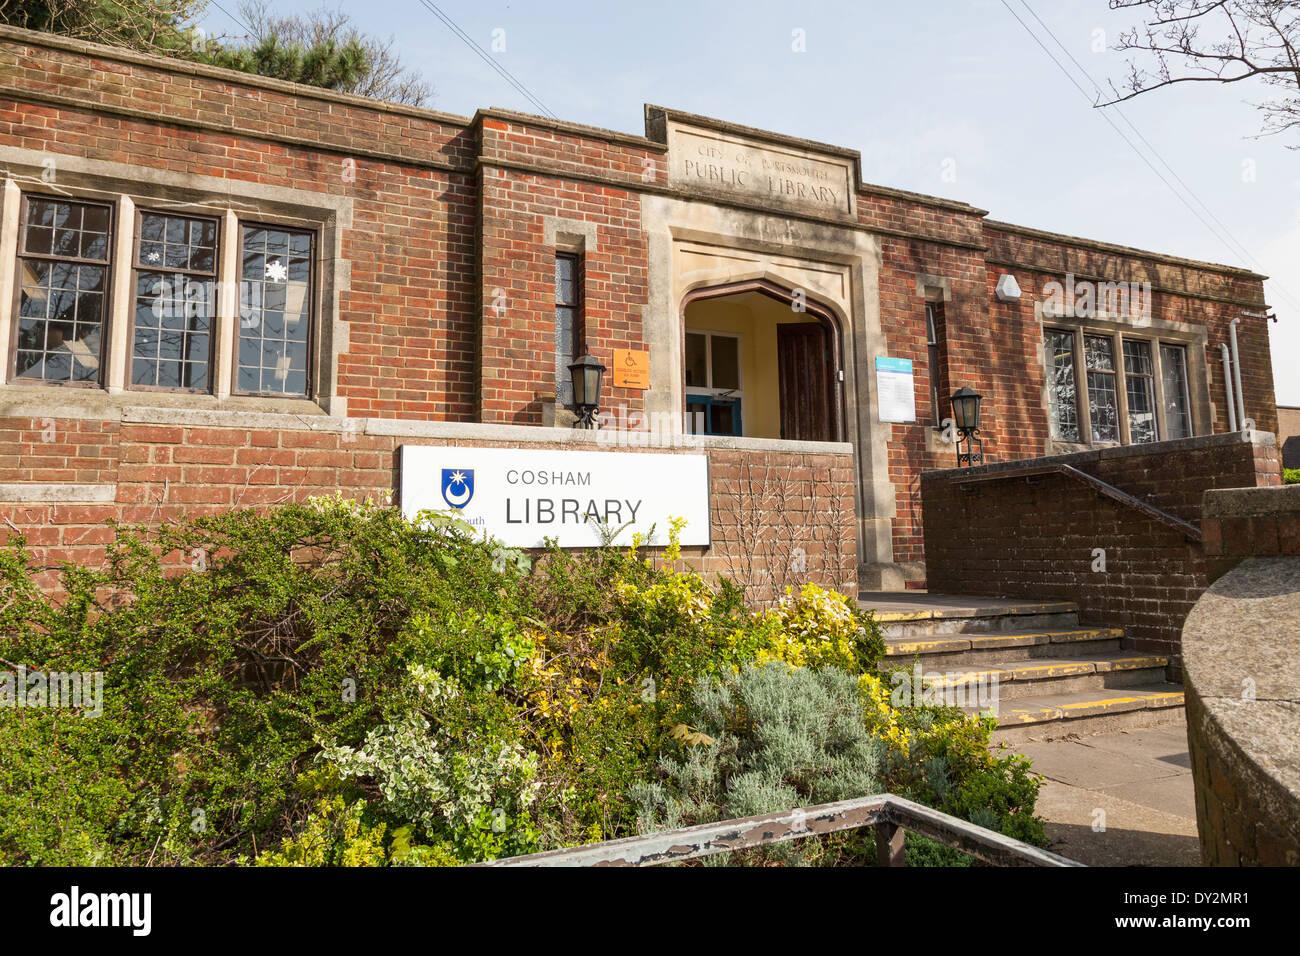 Library Exterior Uk Stockfotos & Library Exterior Uk Bilder - Alamy